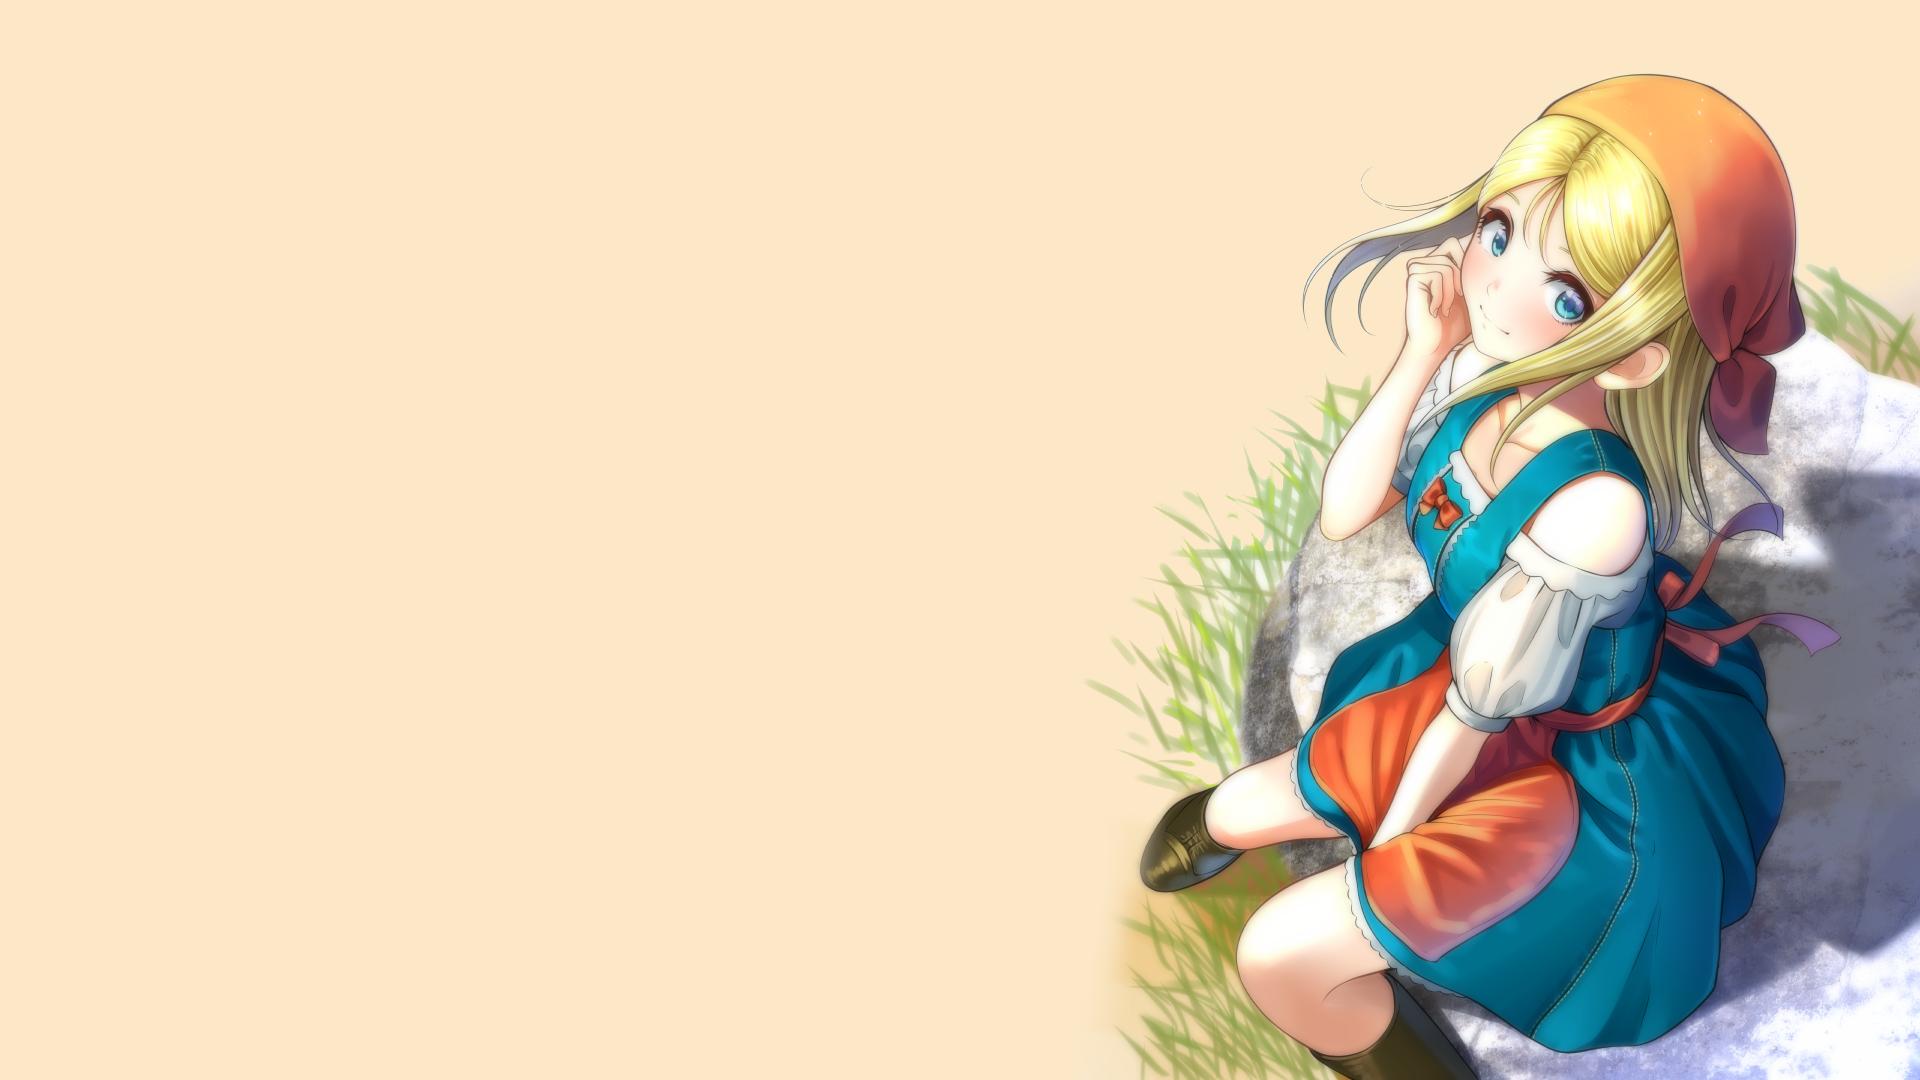 Dragon Quest Xi Hd Wallpaper Background Image 1920x1080 Id